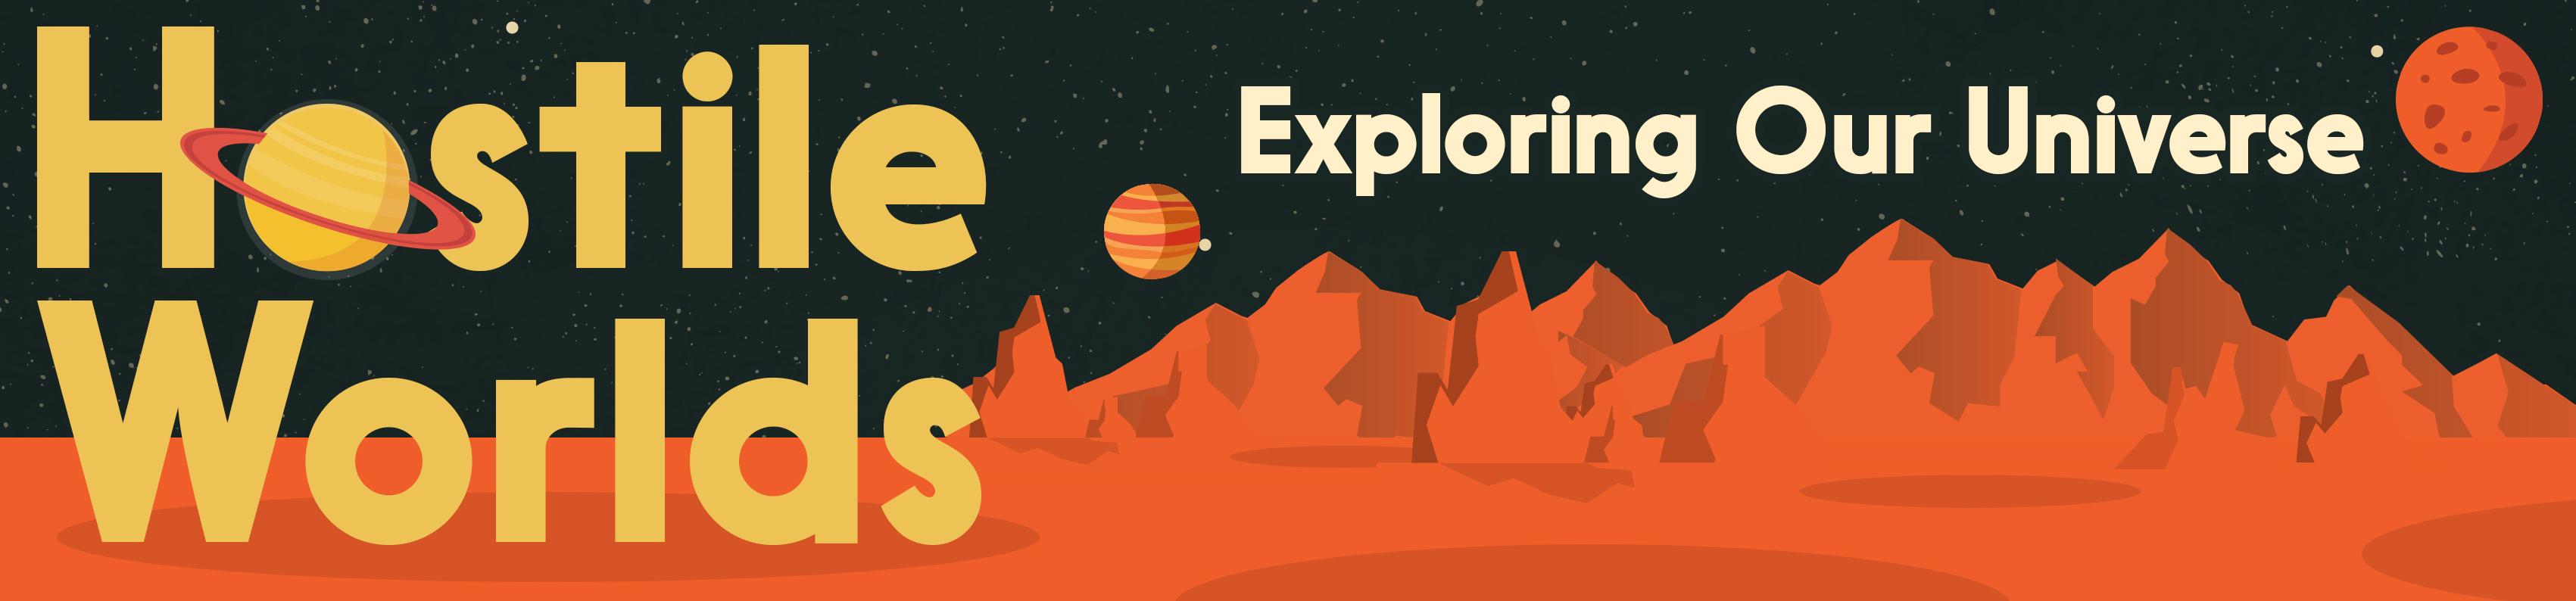 Hostile Worlds Space exploration podcast